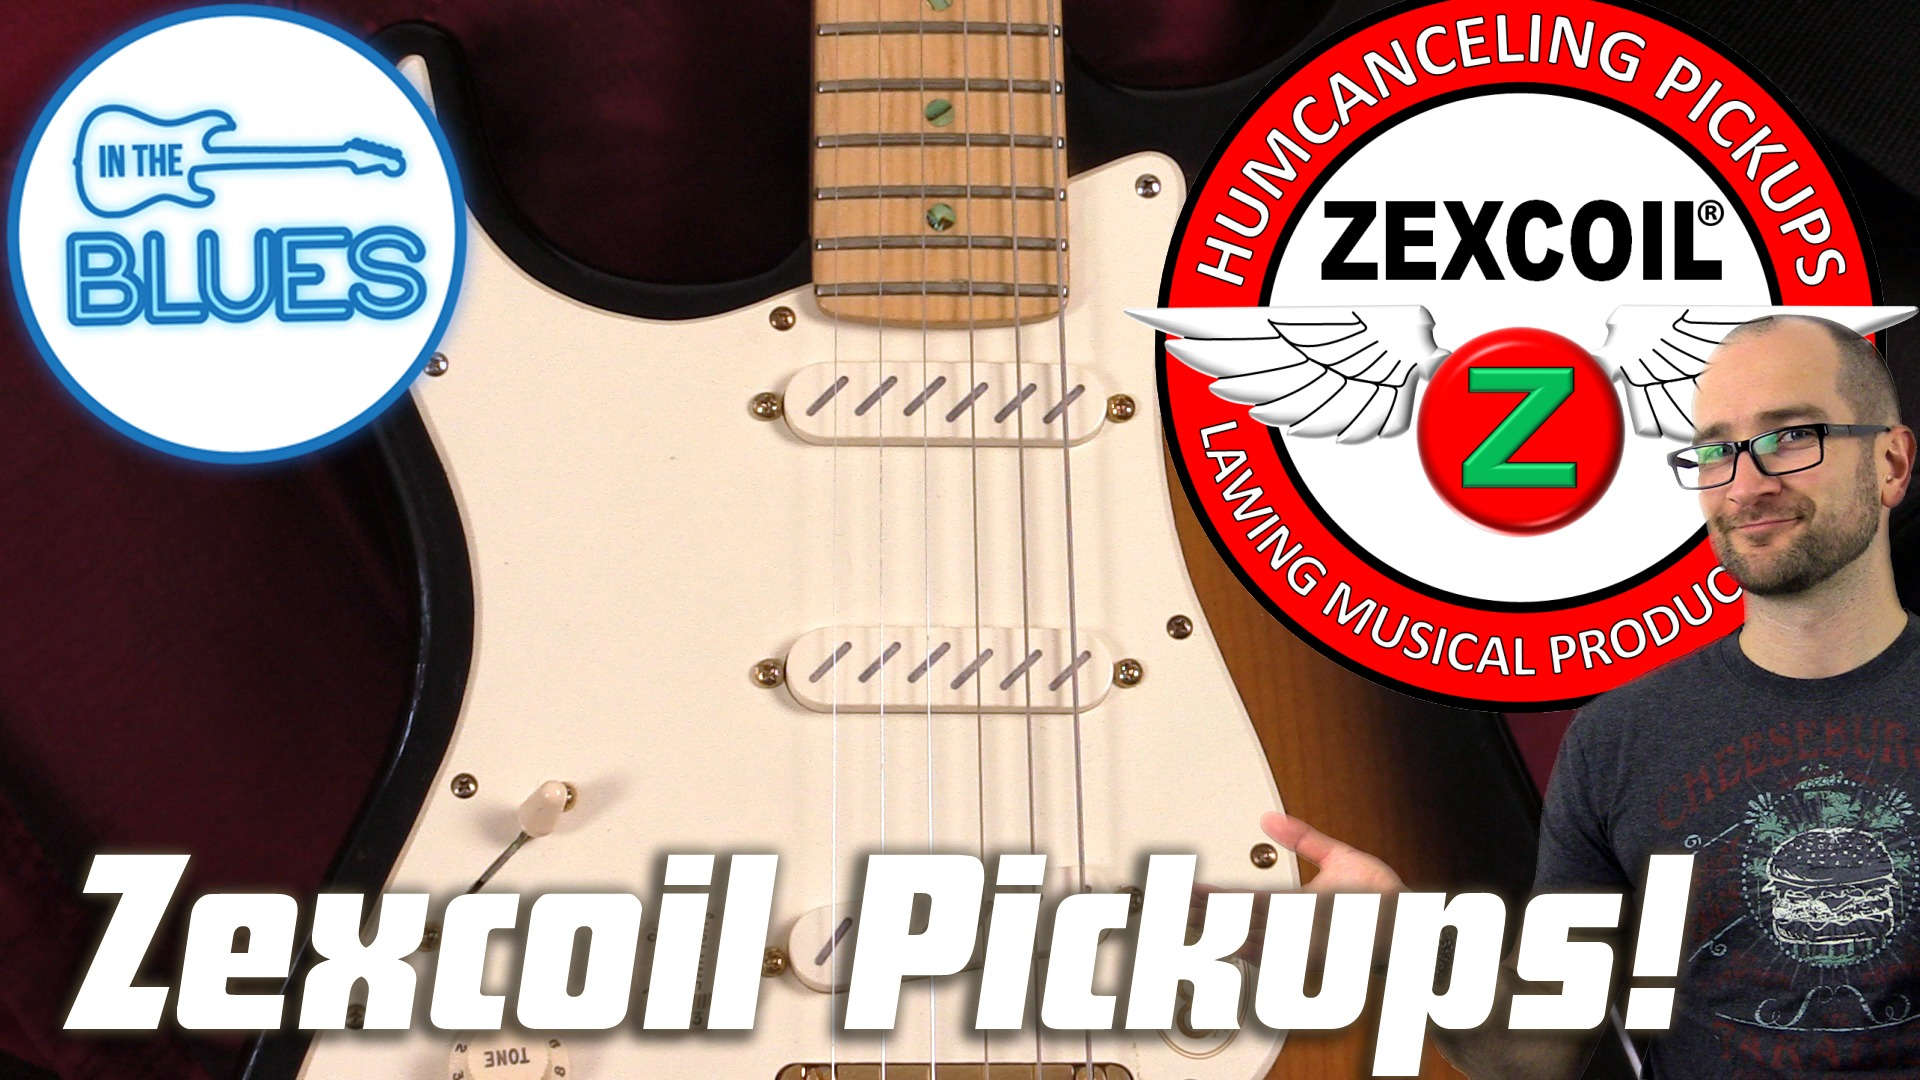 Zexcoil Stratocaster Pickups Texas Set Review